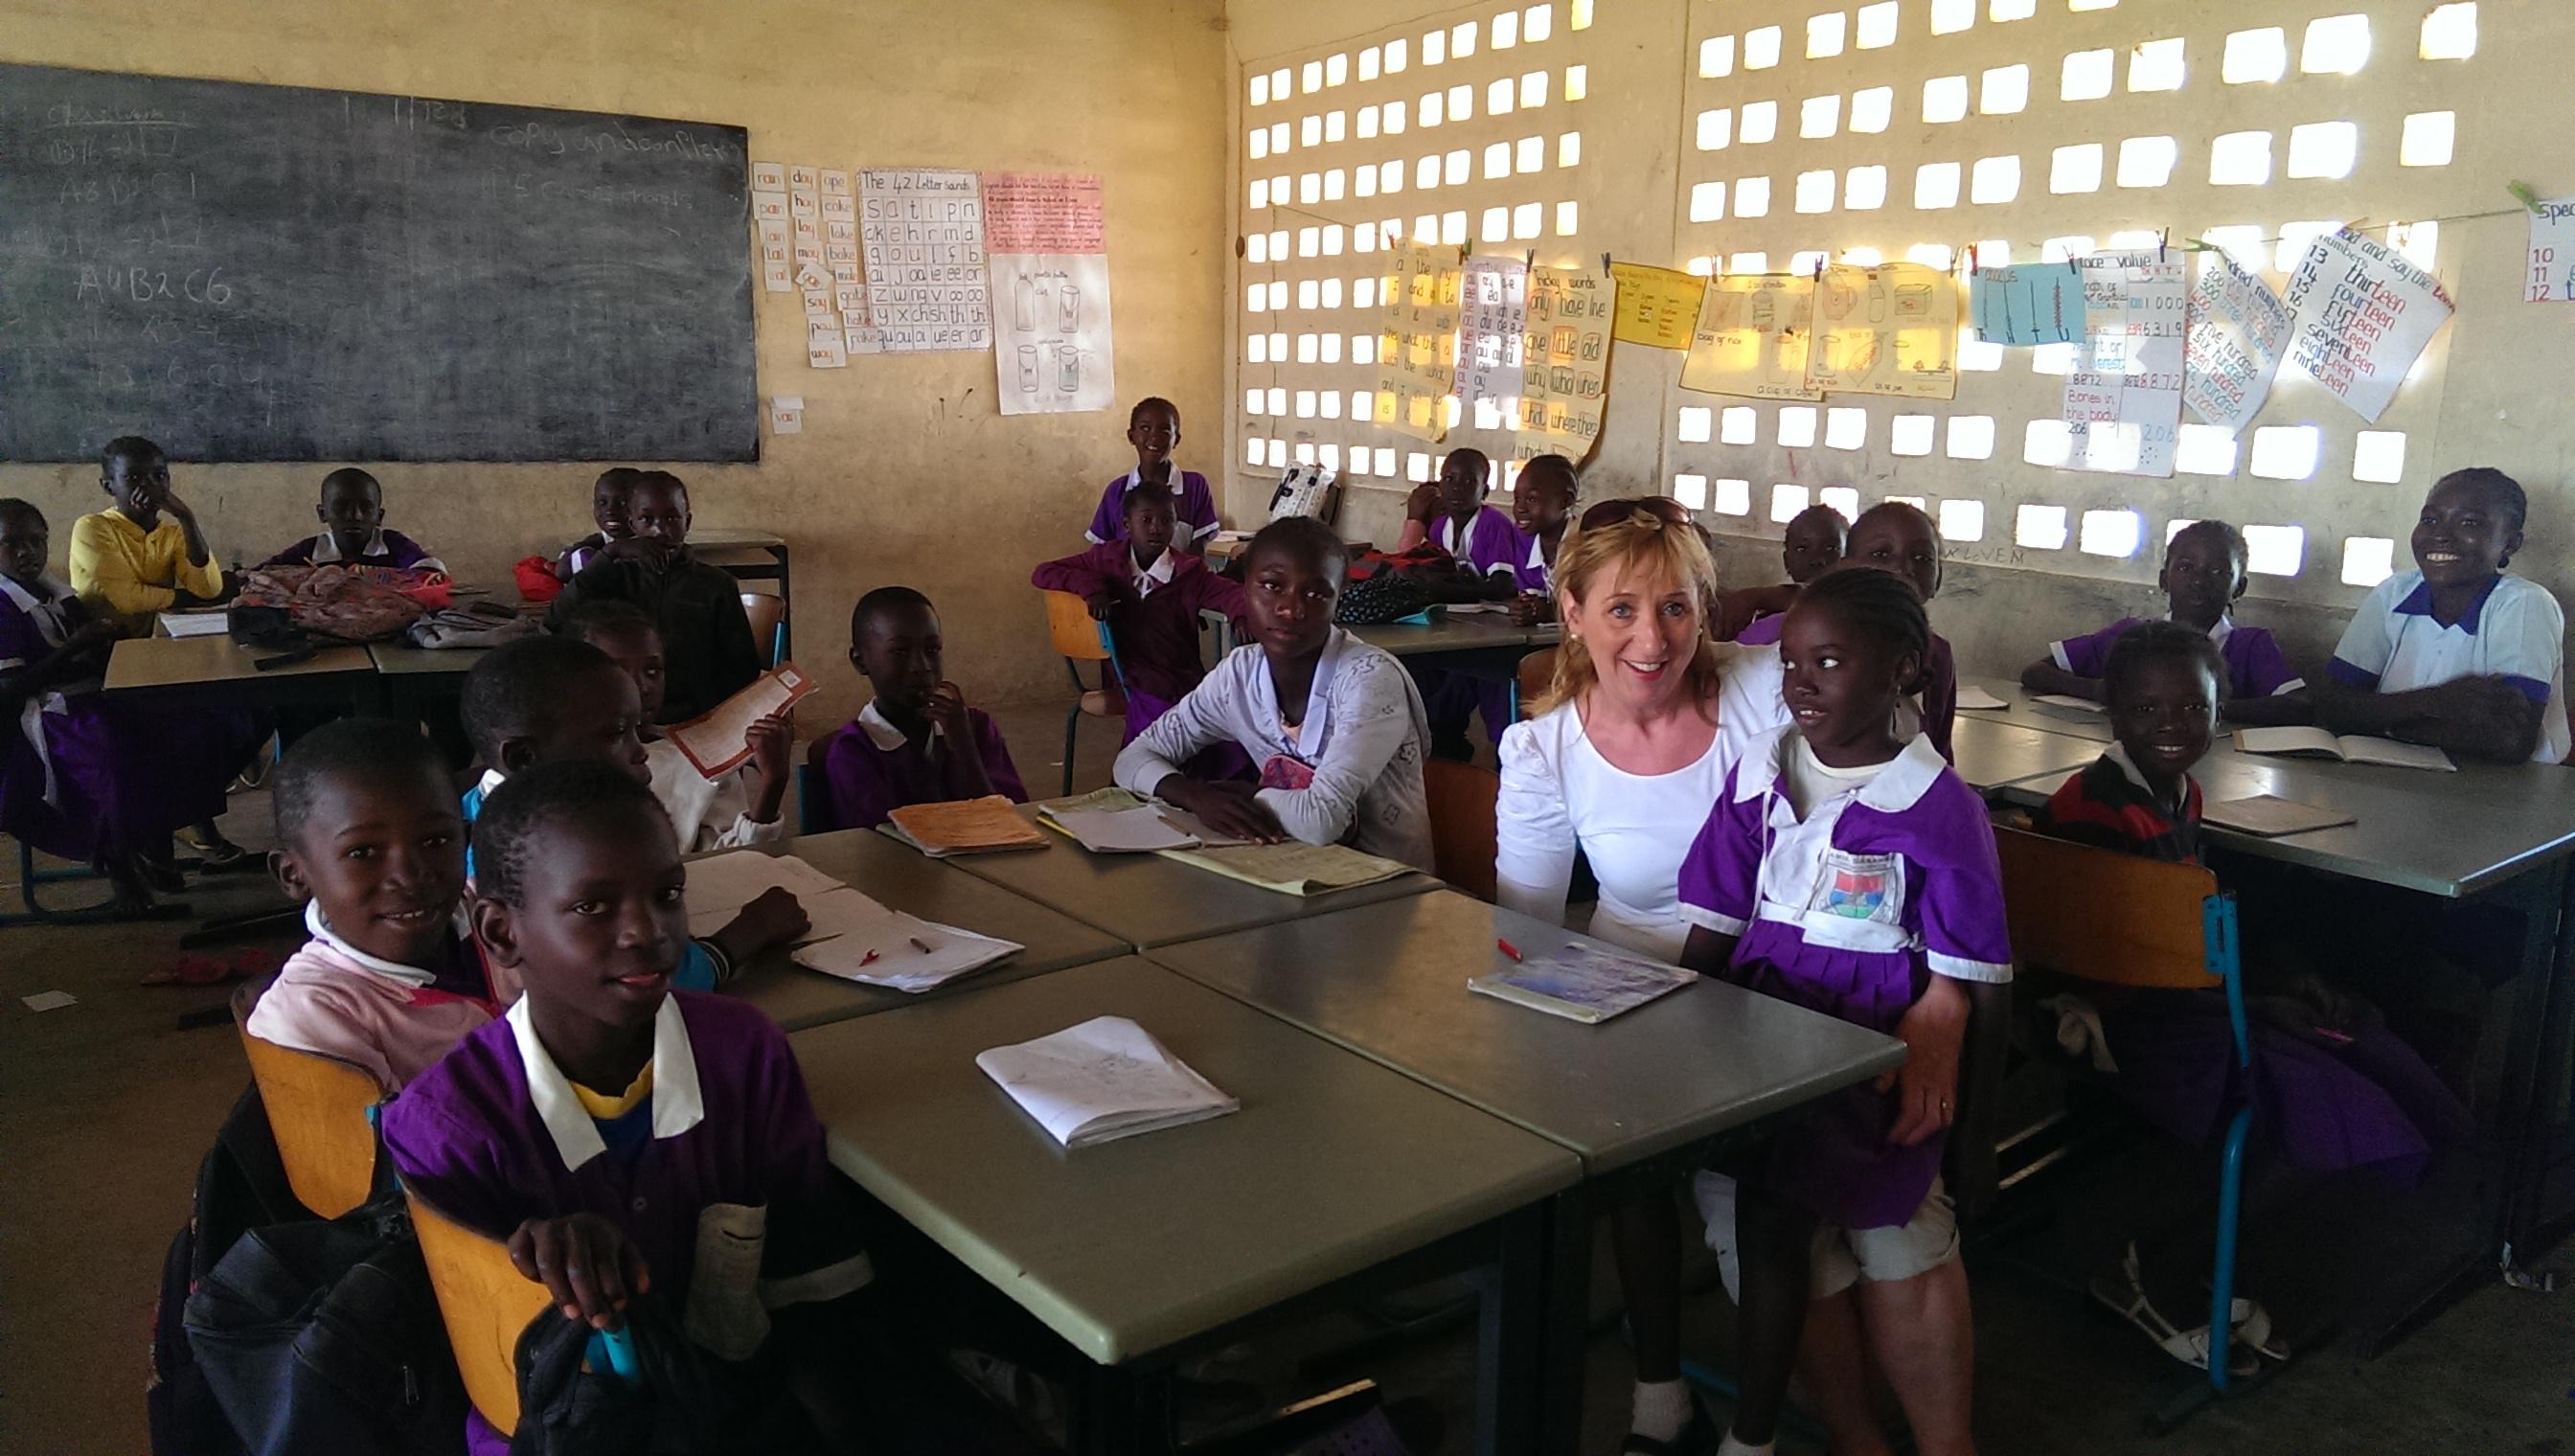 Bommelerwaard oud meubilair spelwert naar gambia for Meubilair basisschool